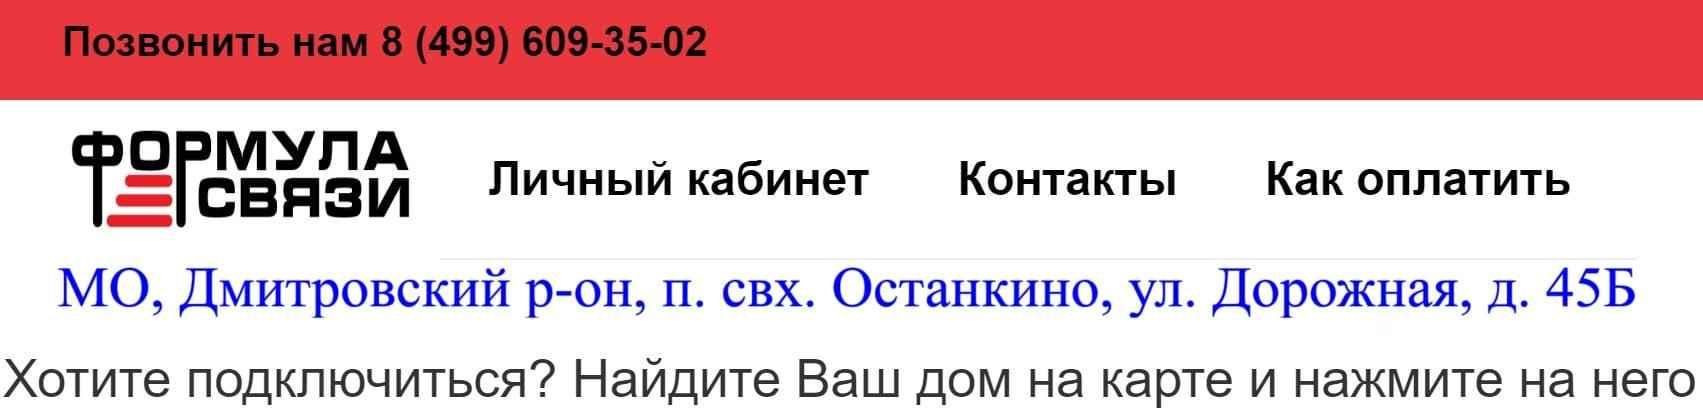 Формула связи formulanet.ru